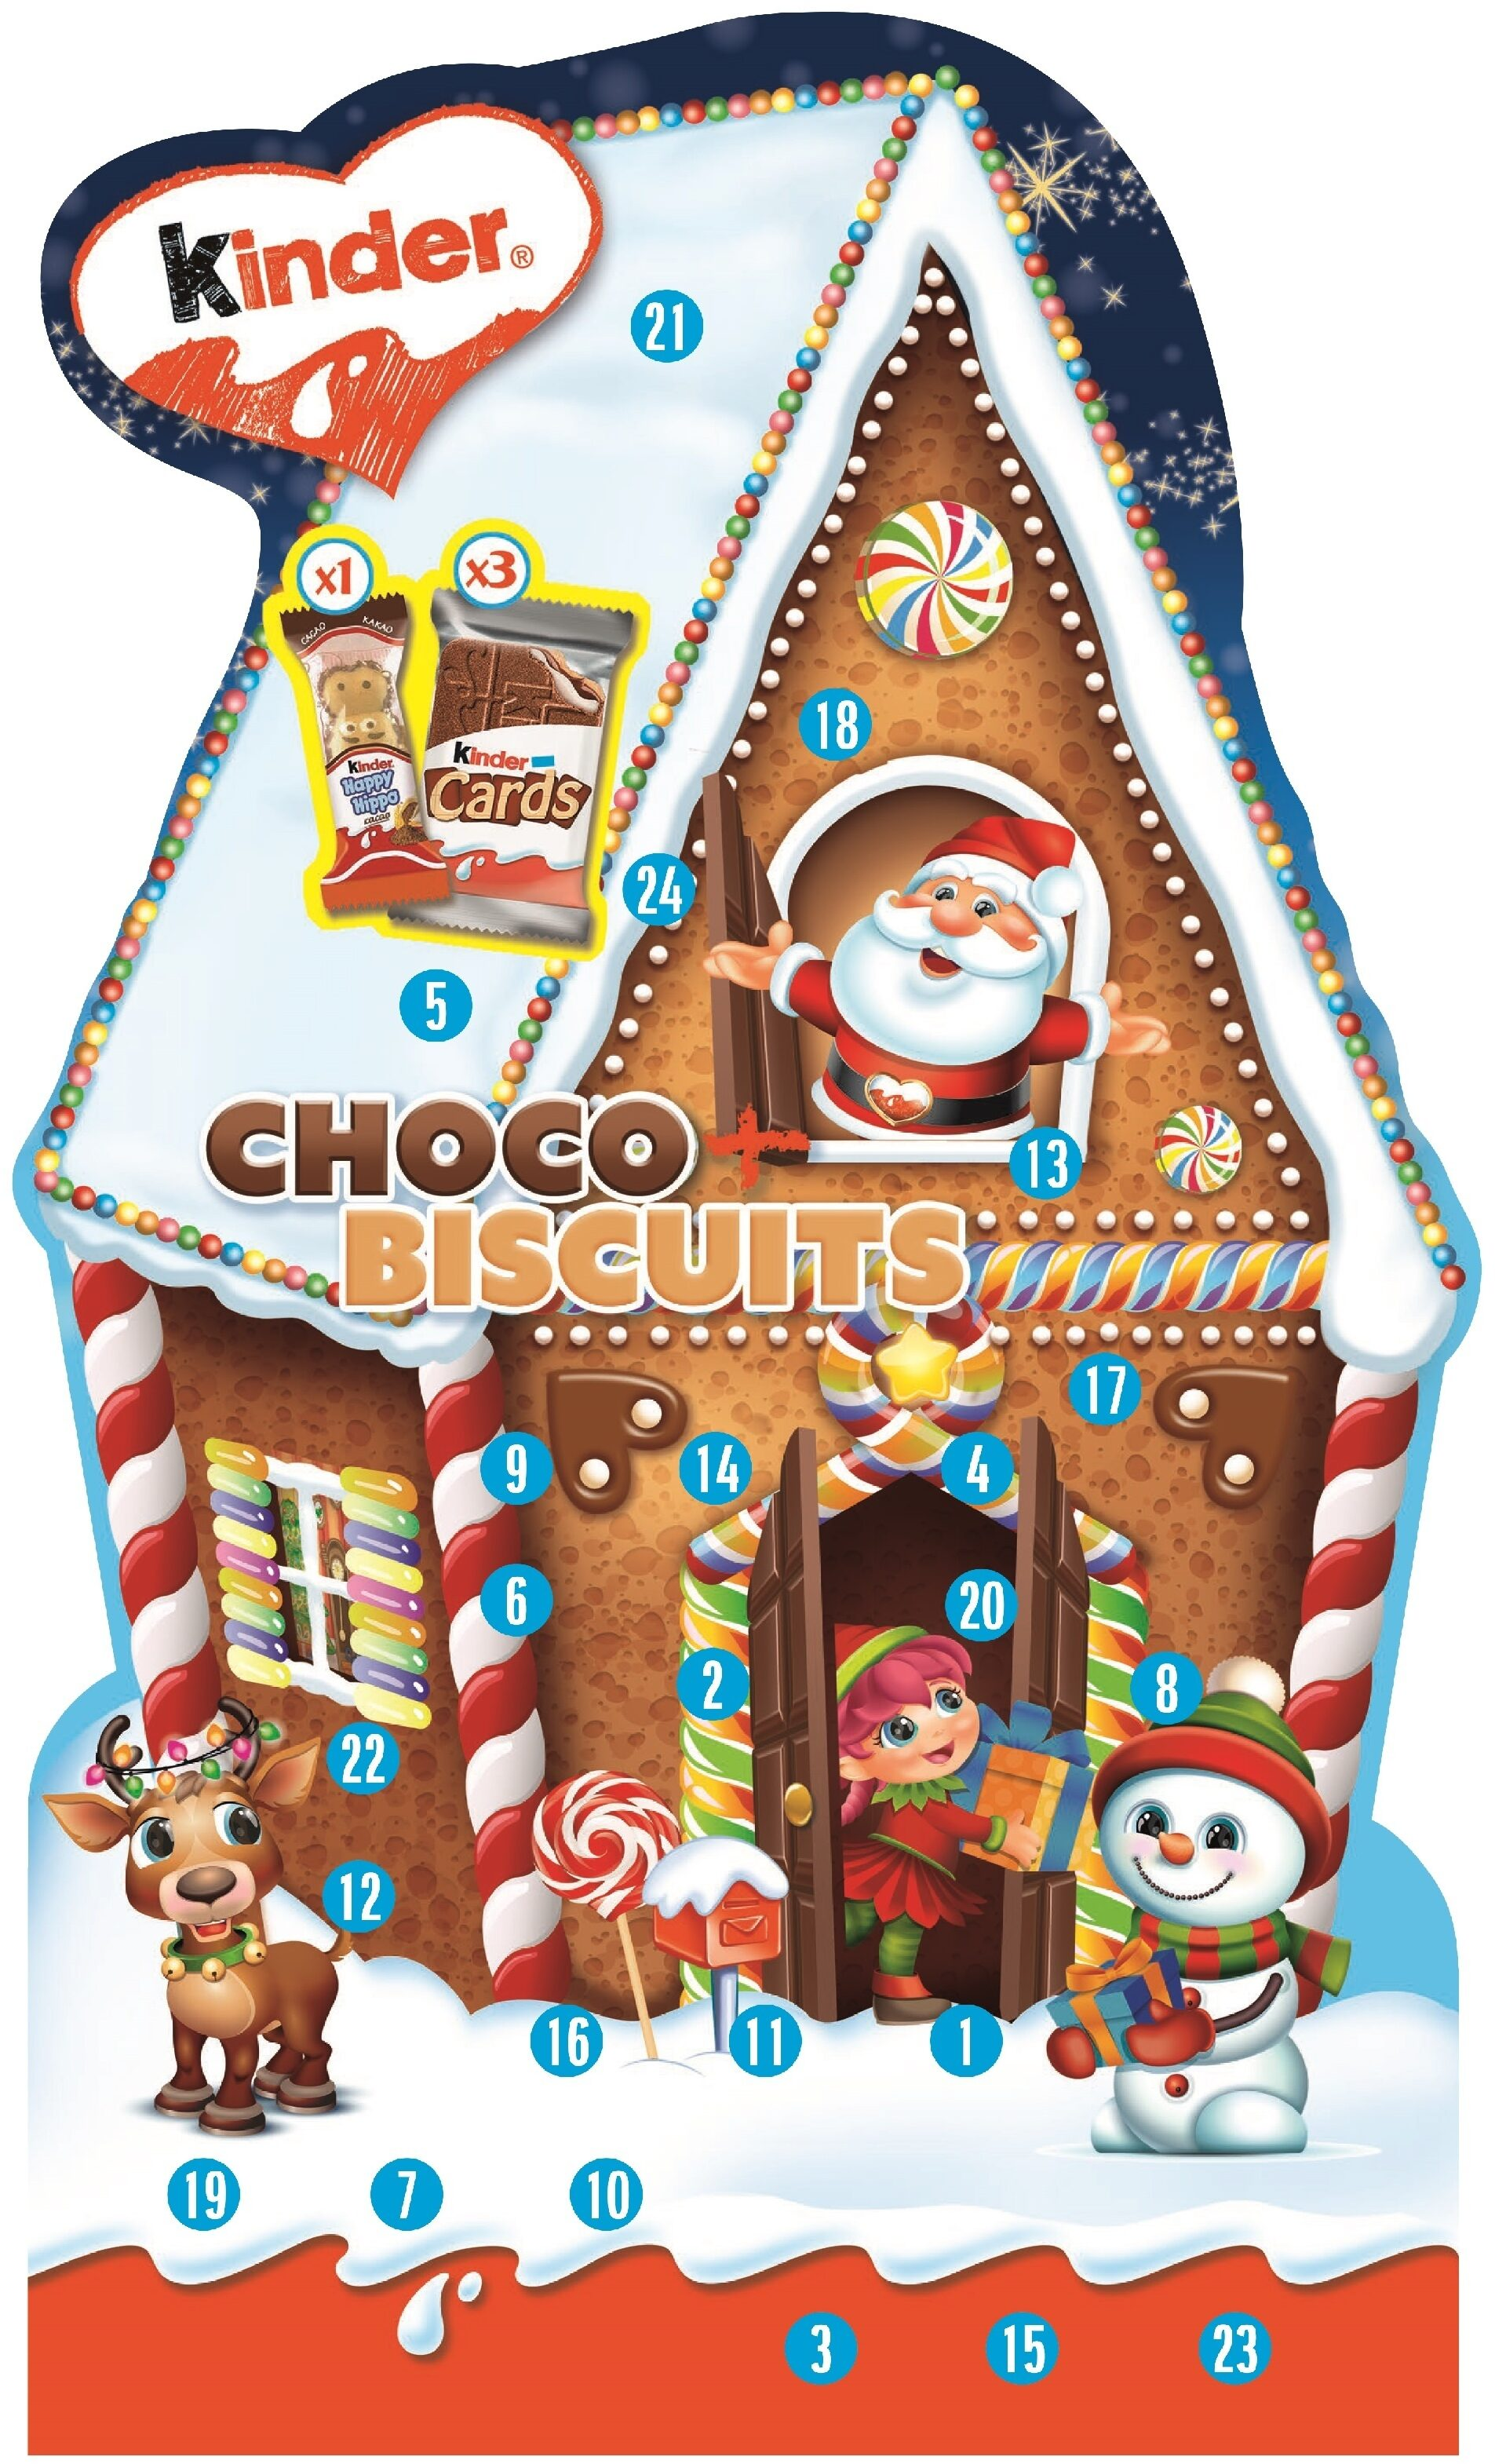 Kinder calendrier biscuit 210g choco+biscuit - Produit - fr